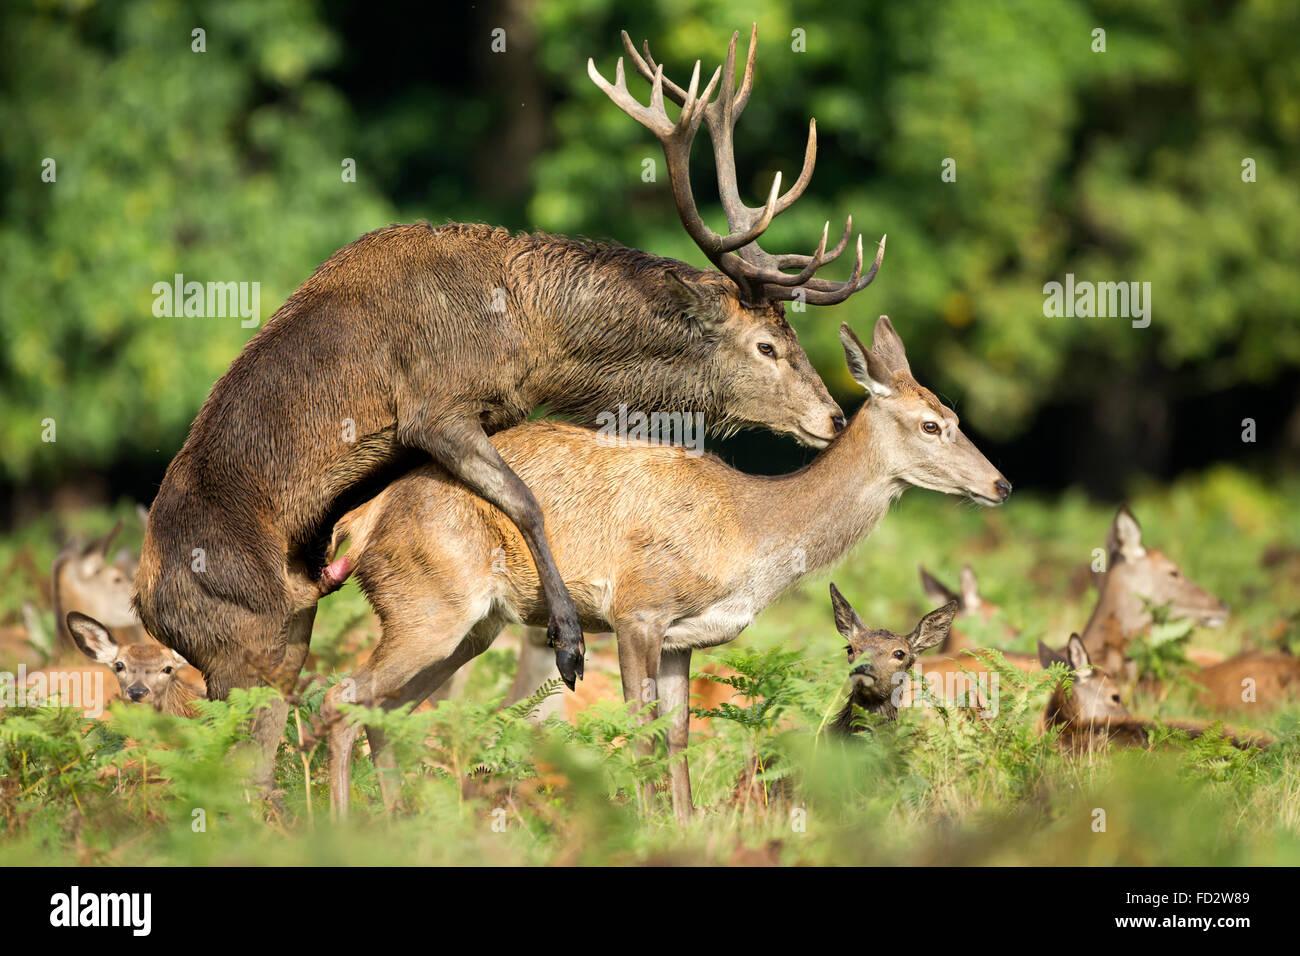 Red deer (Cervus elaphus) mating during the rutting season - Stock Image